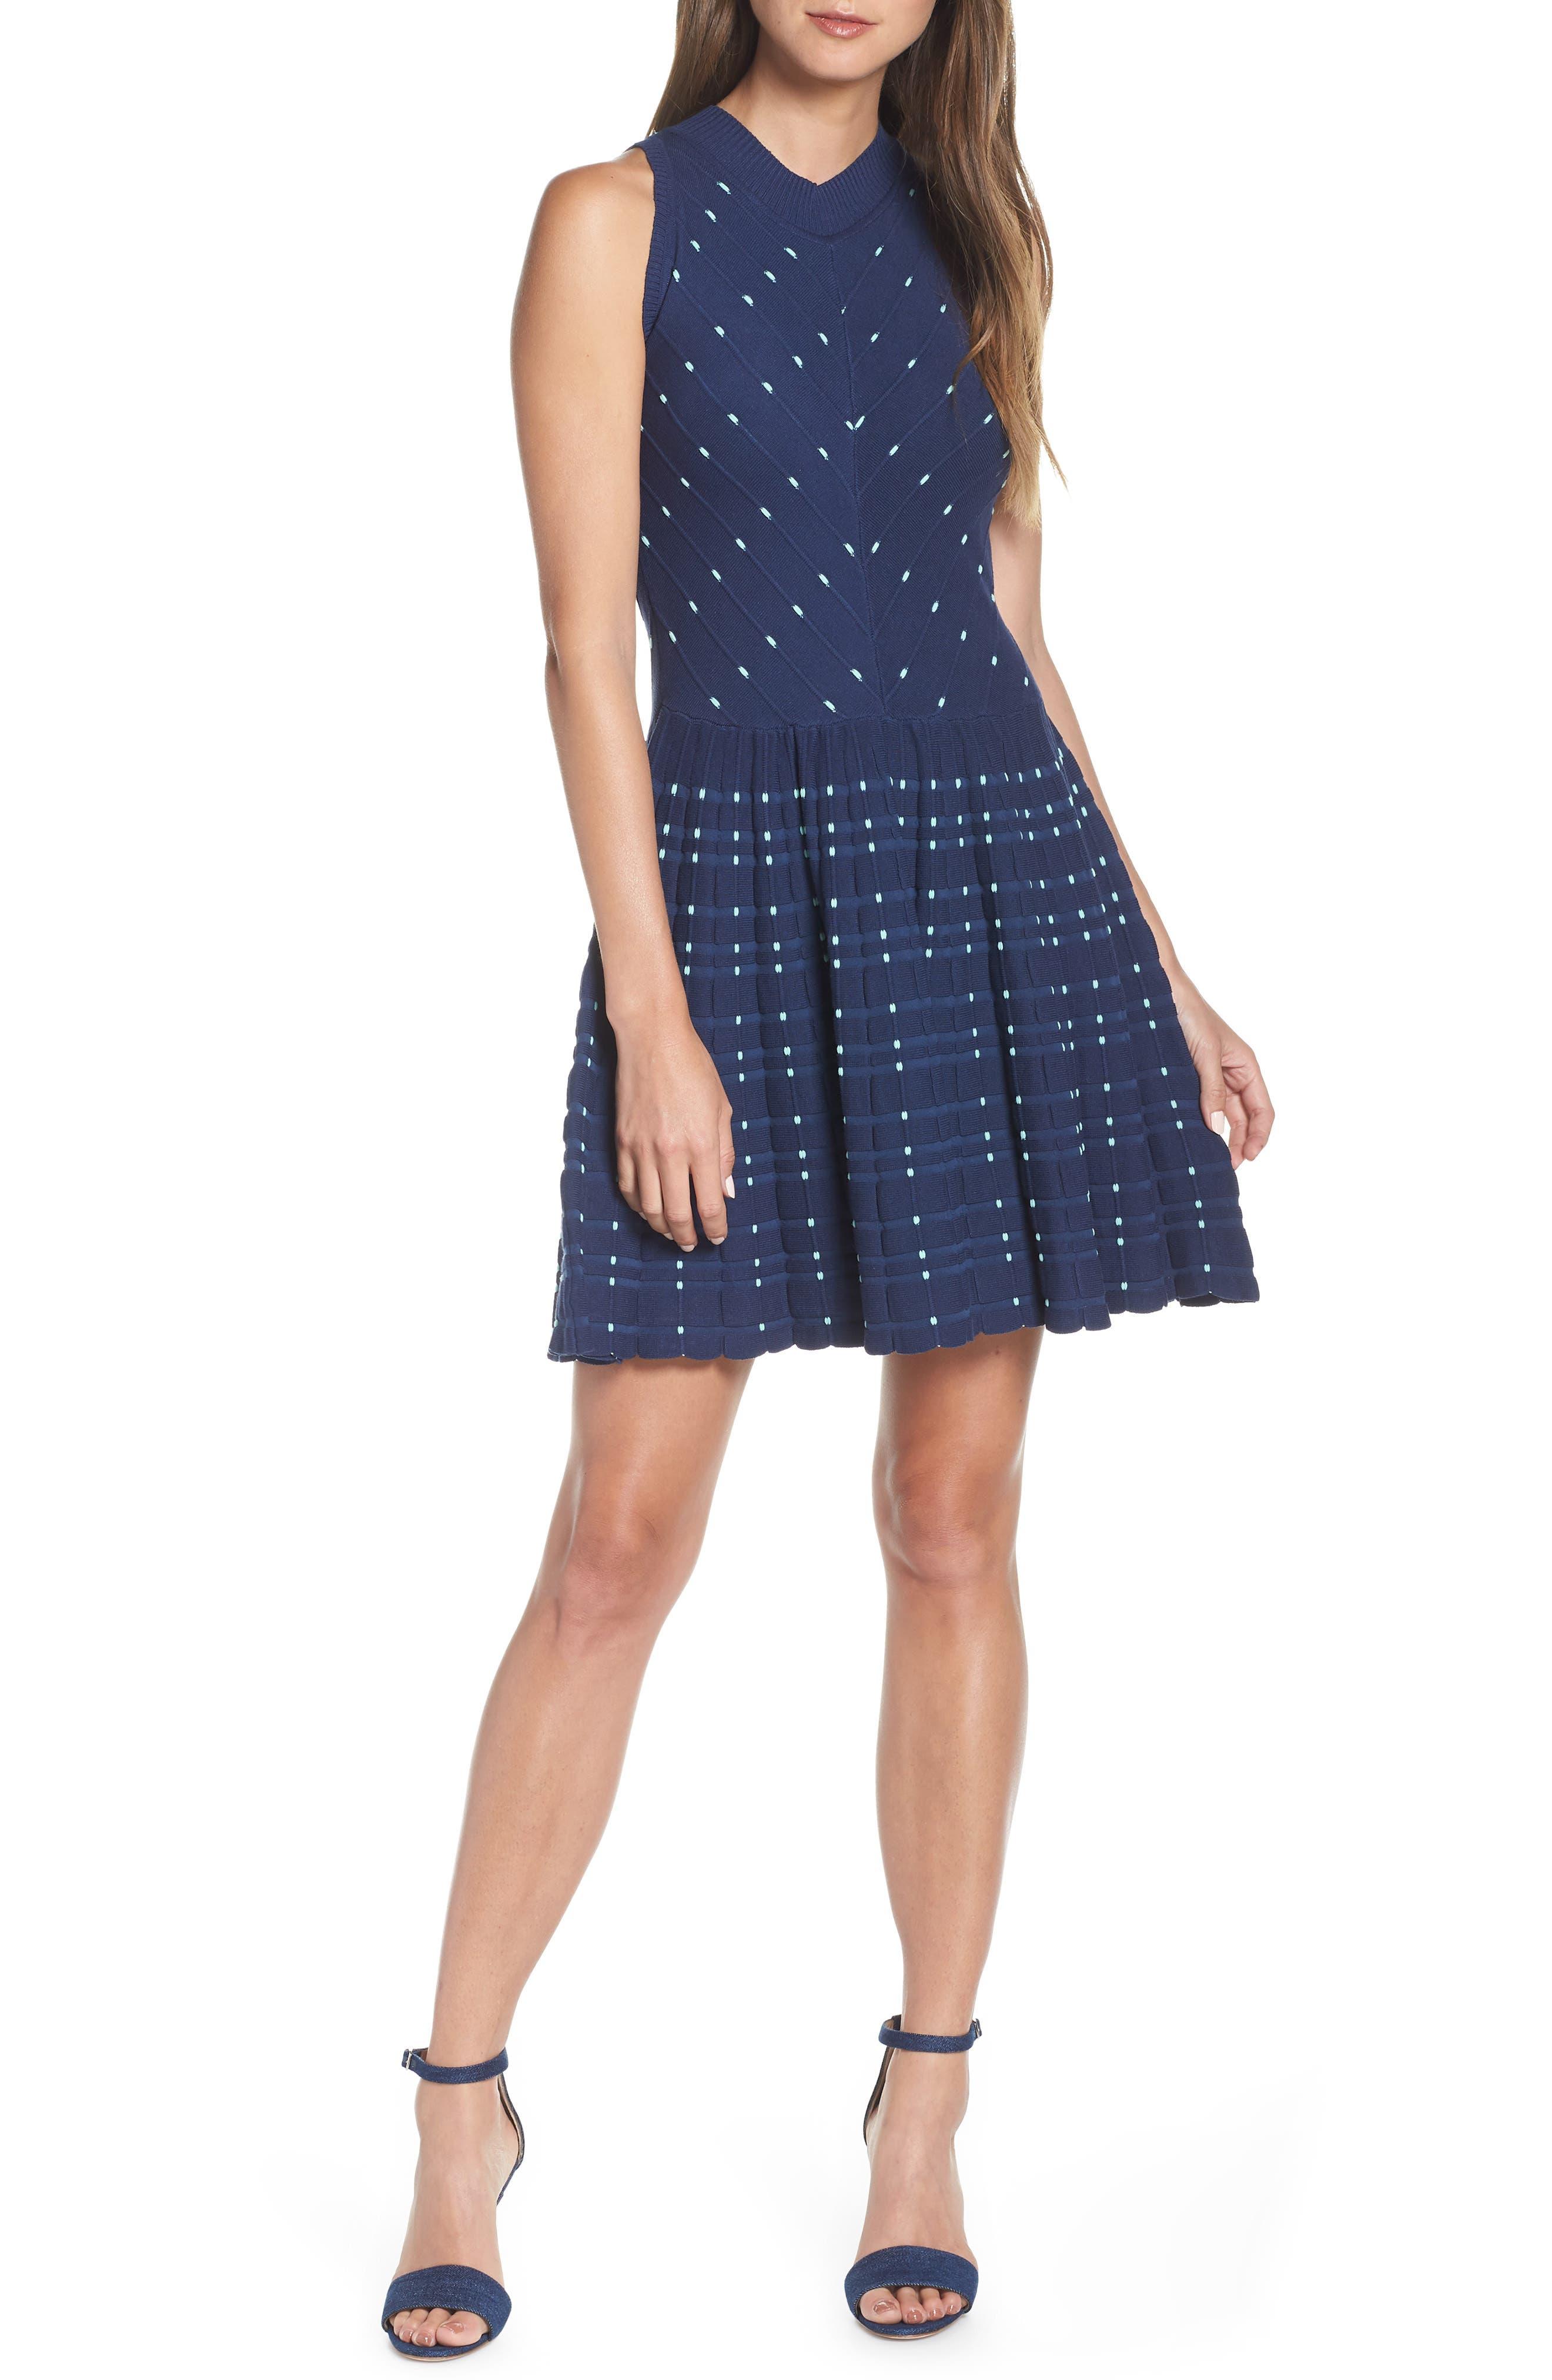 Adelyn Rae Skye Fit & Flare Sweater Dress, Blue